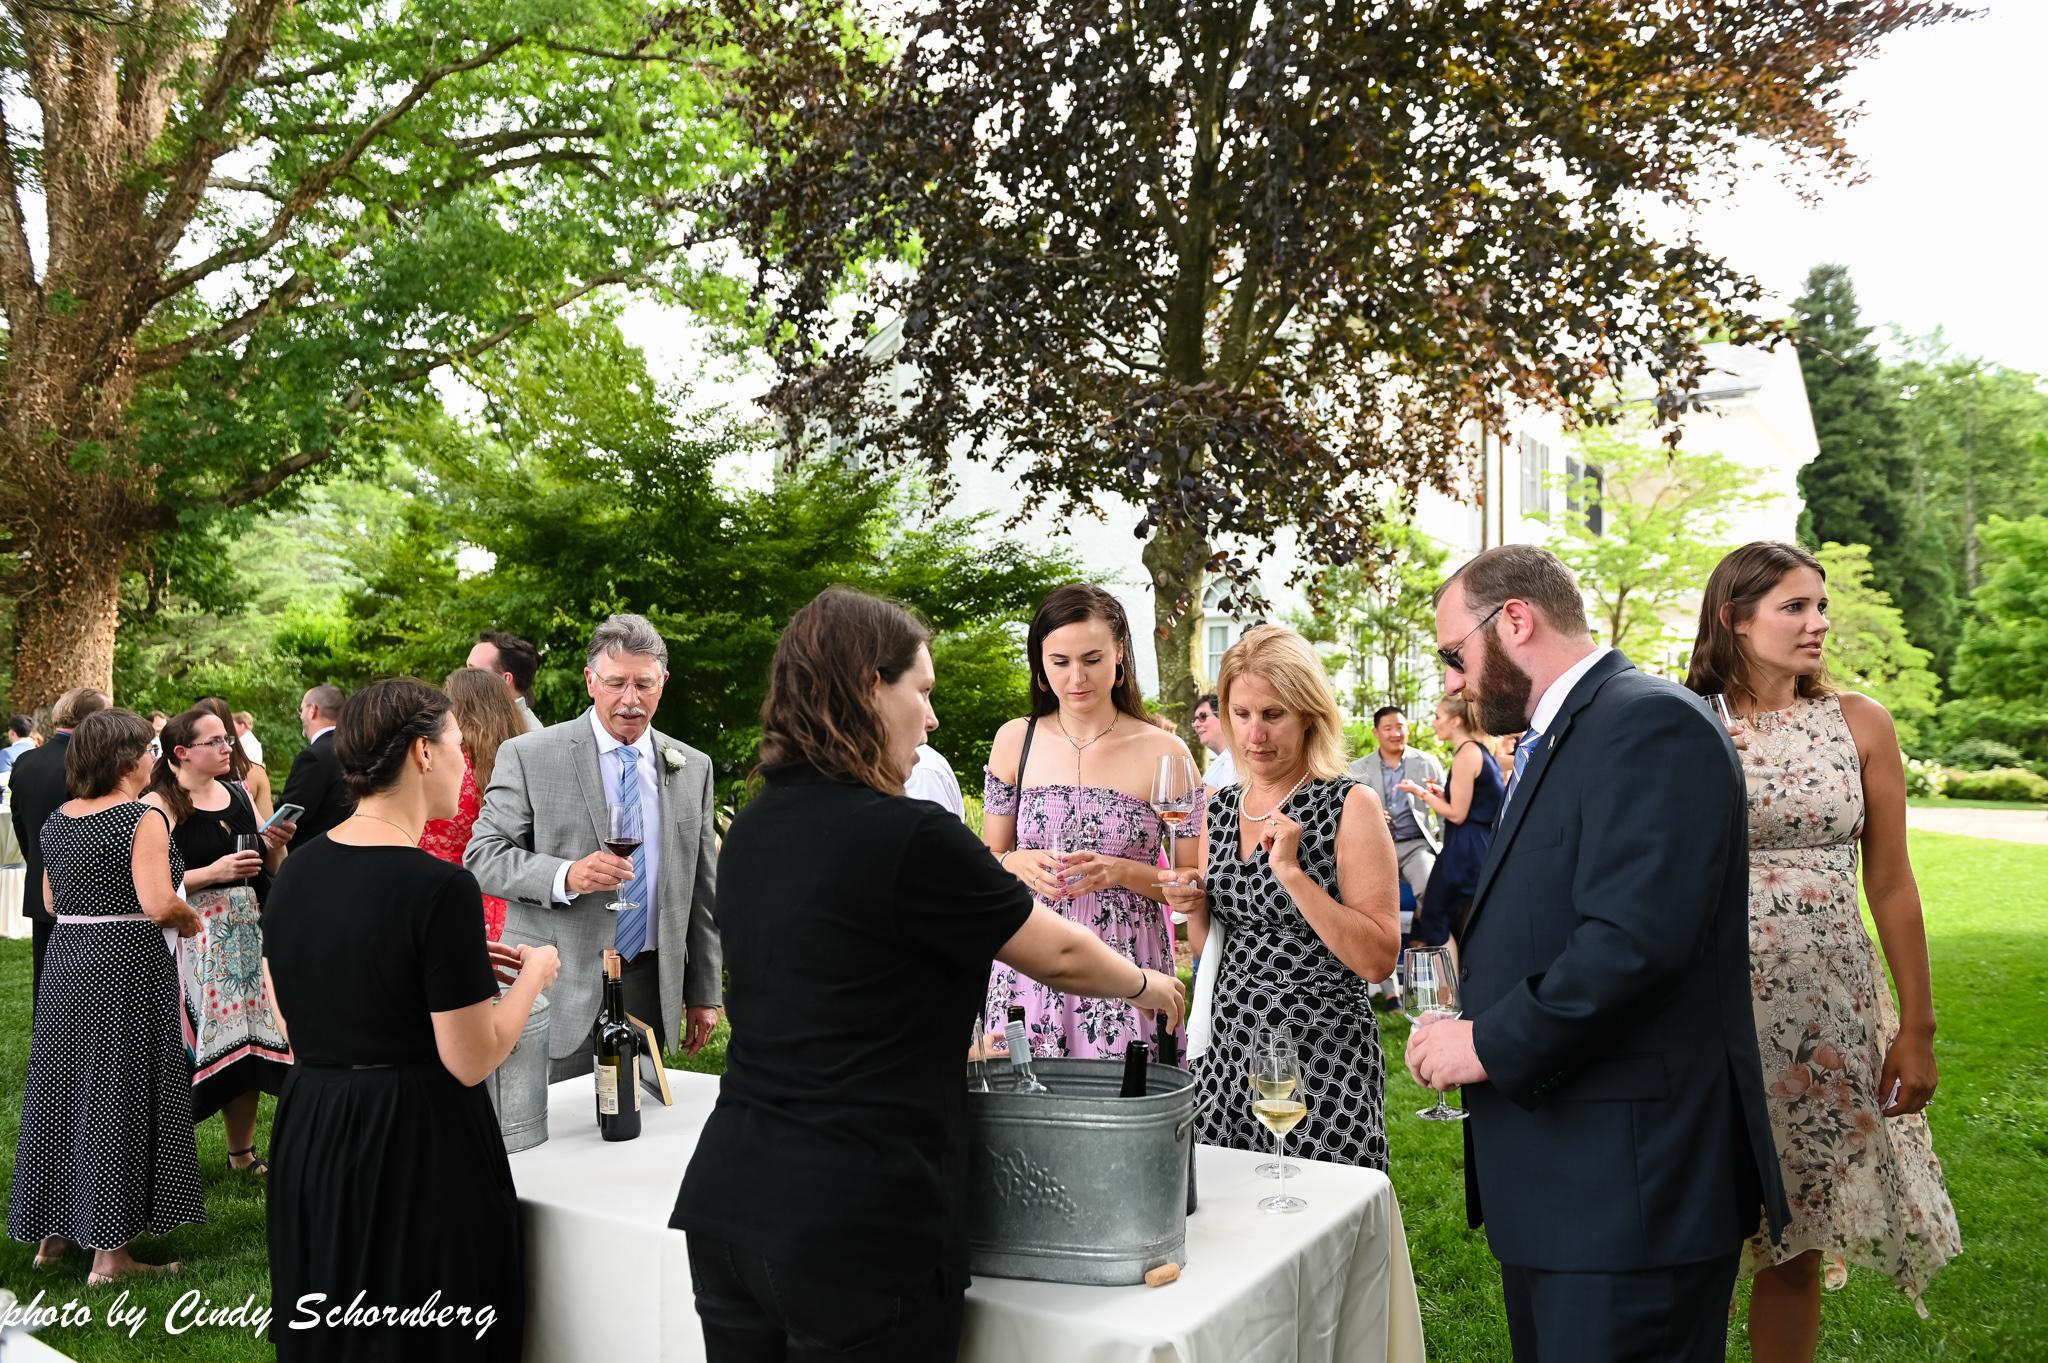 wedding_tasting_wine_bar.jpg